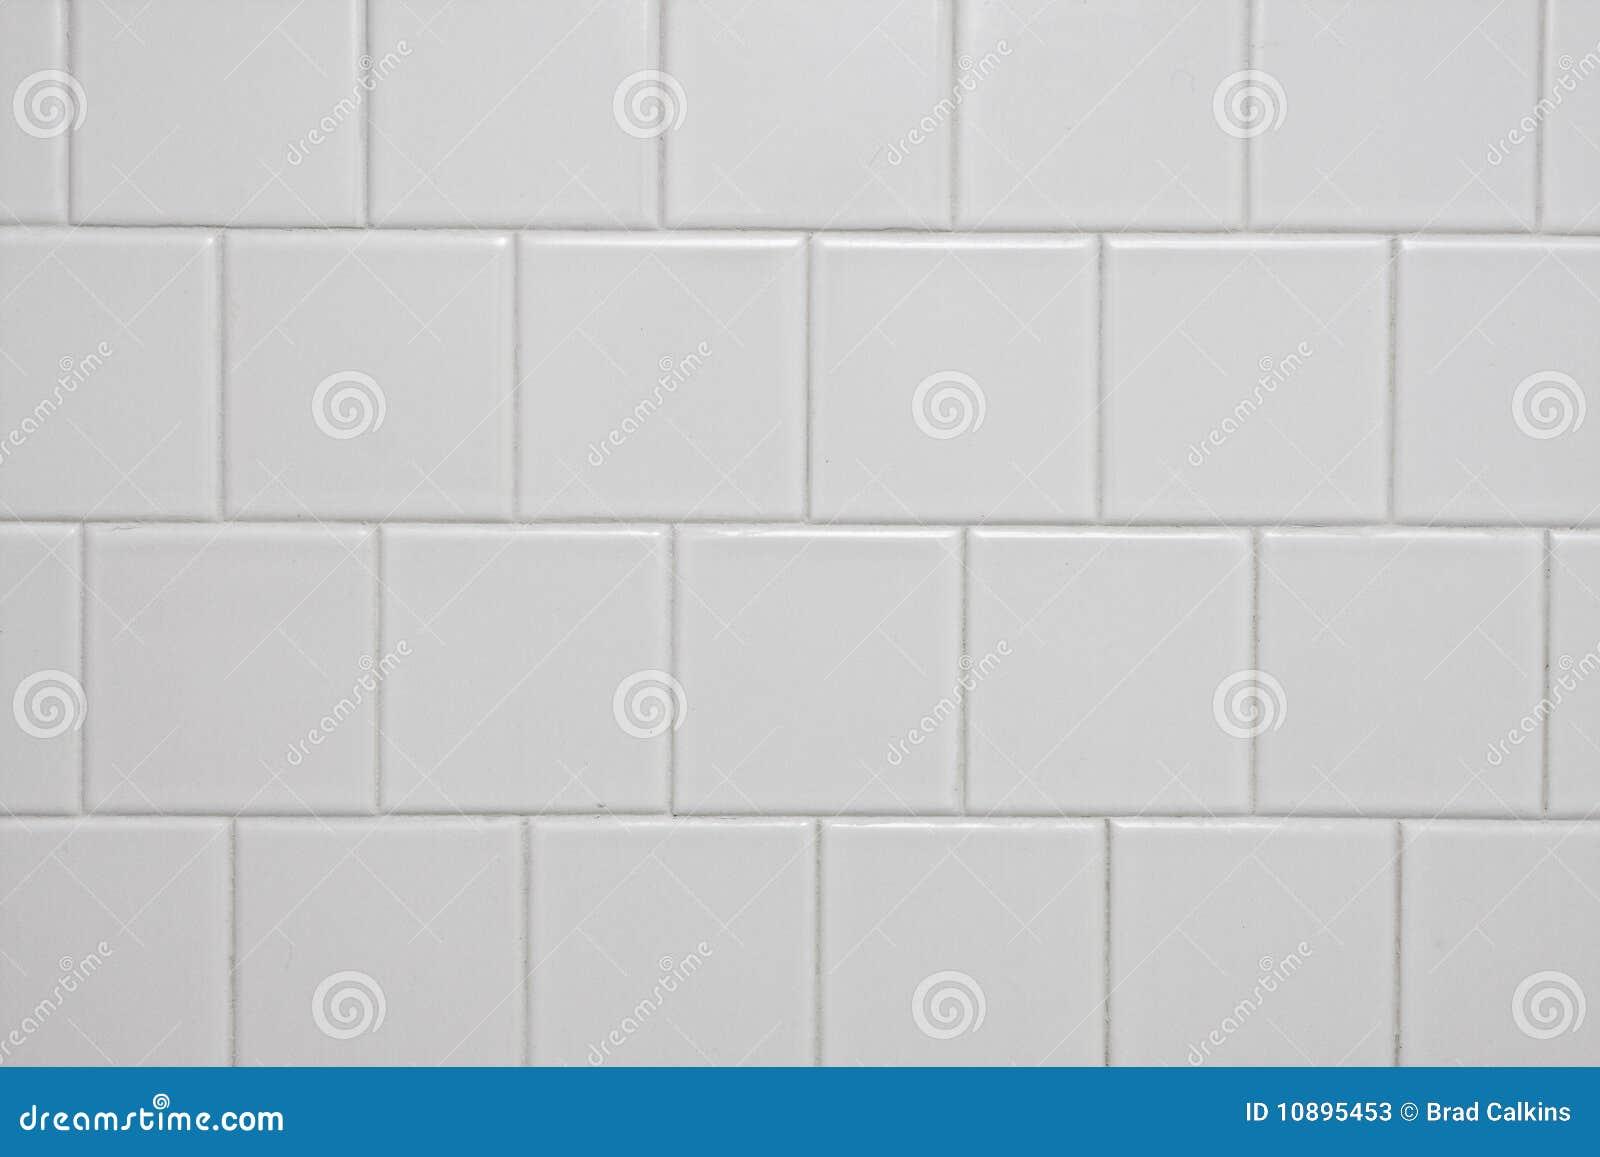 Tiles Subway Tiles